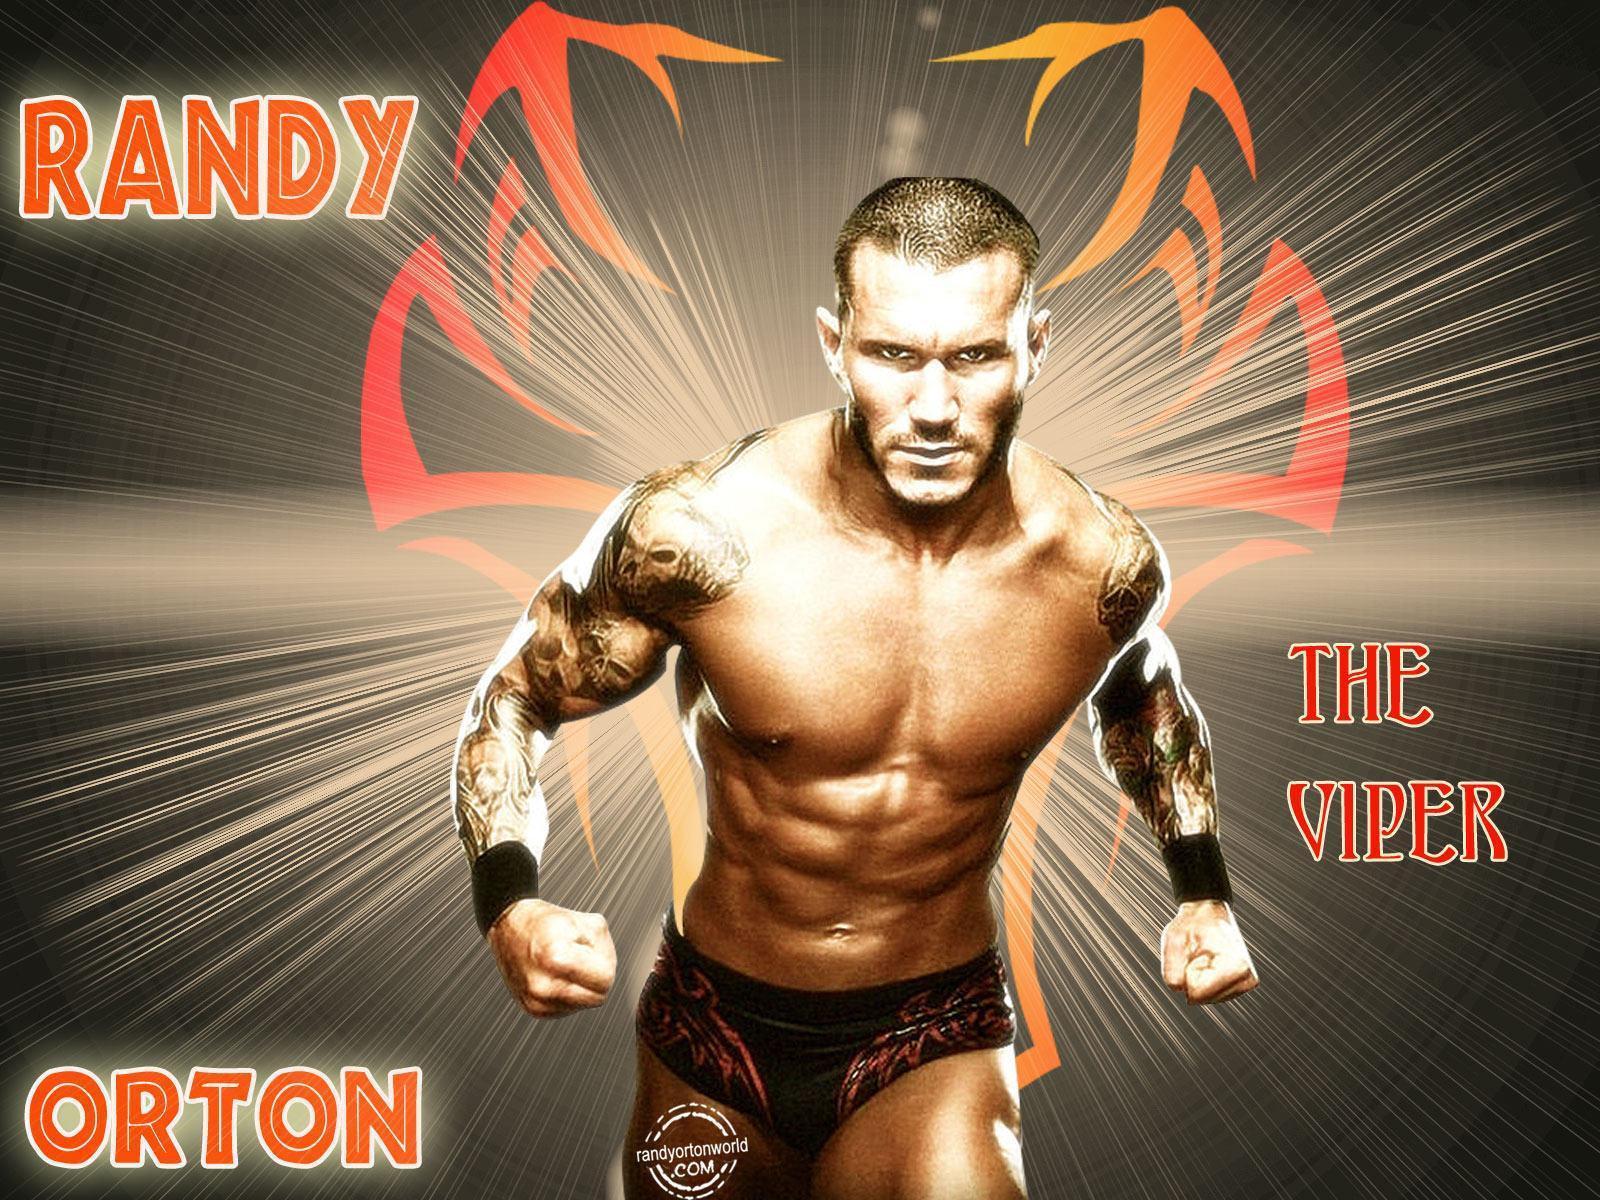 Randy Orton HD Wallpapers: Randy Orton The Viper Wallpapers